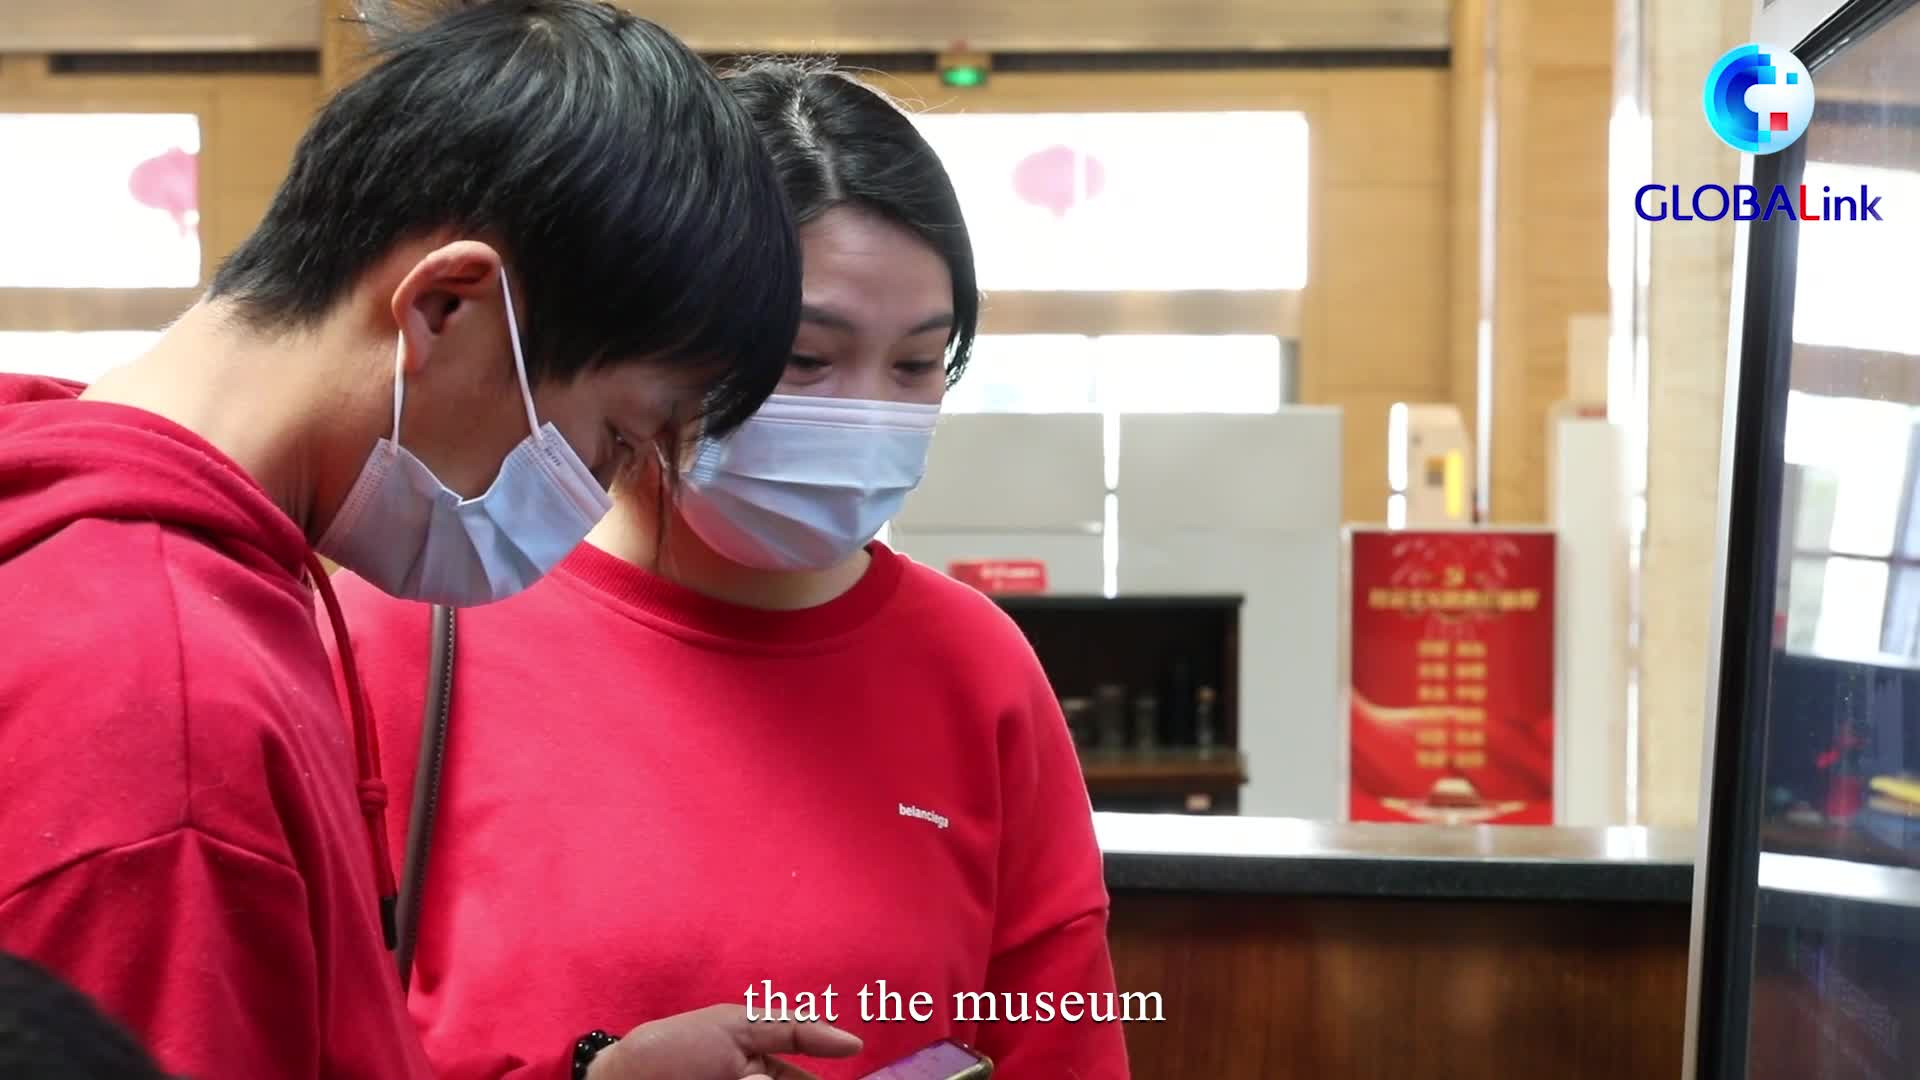 GLOBALink | Spring Festival celebrated in cultural venues in Wuhan